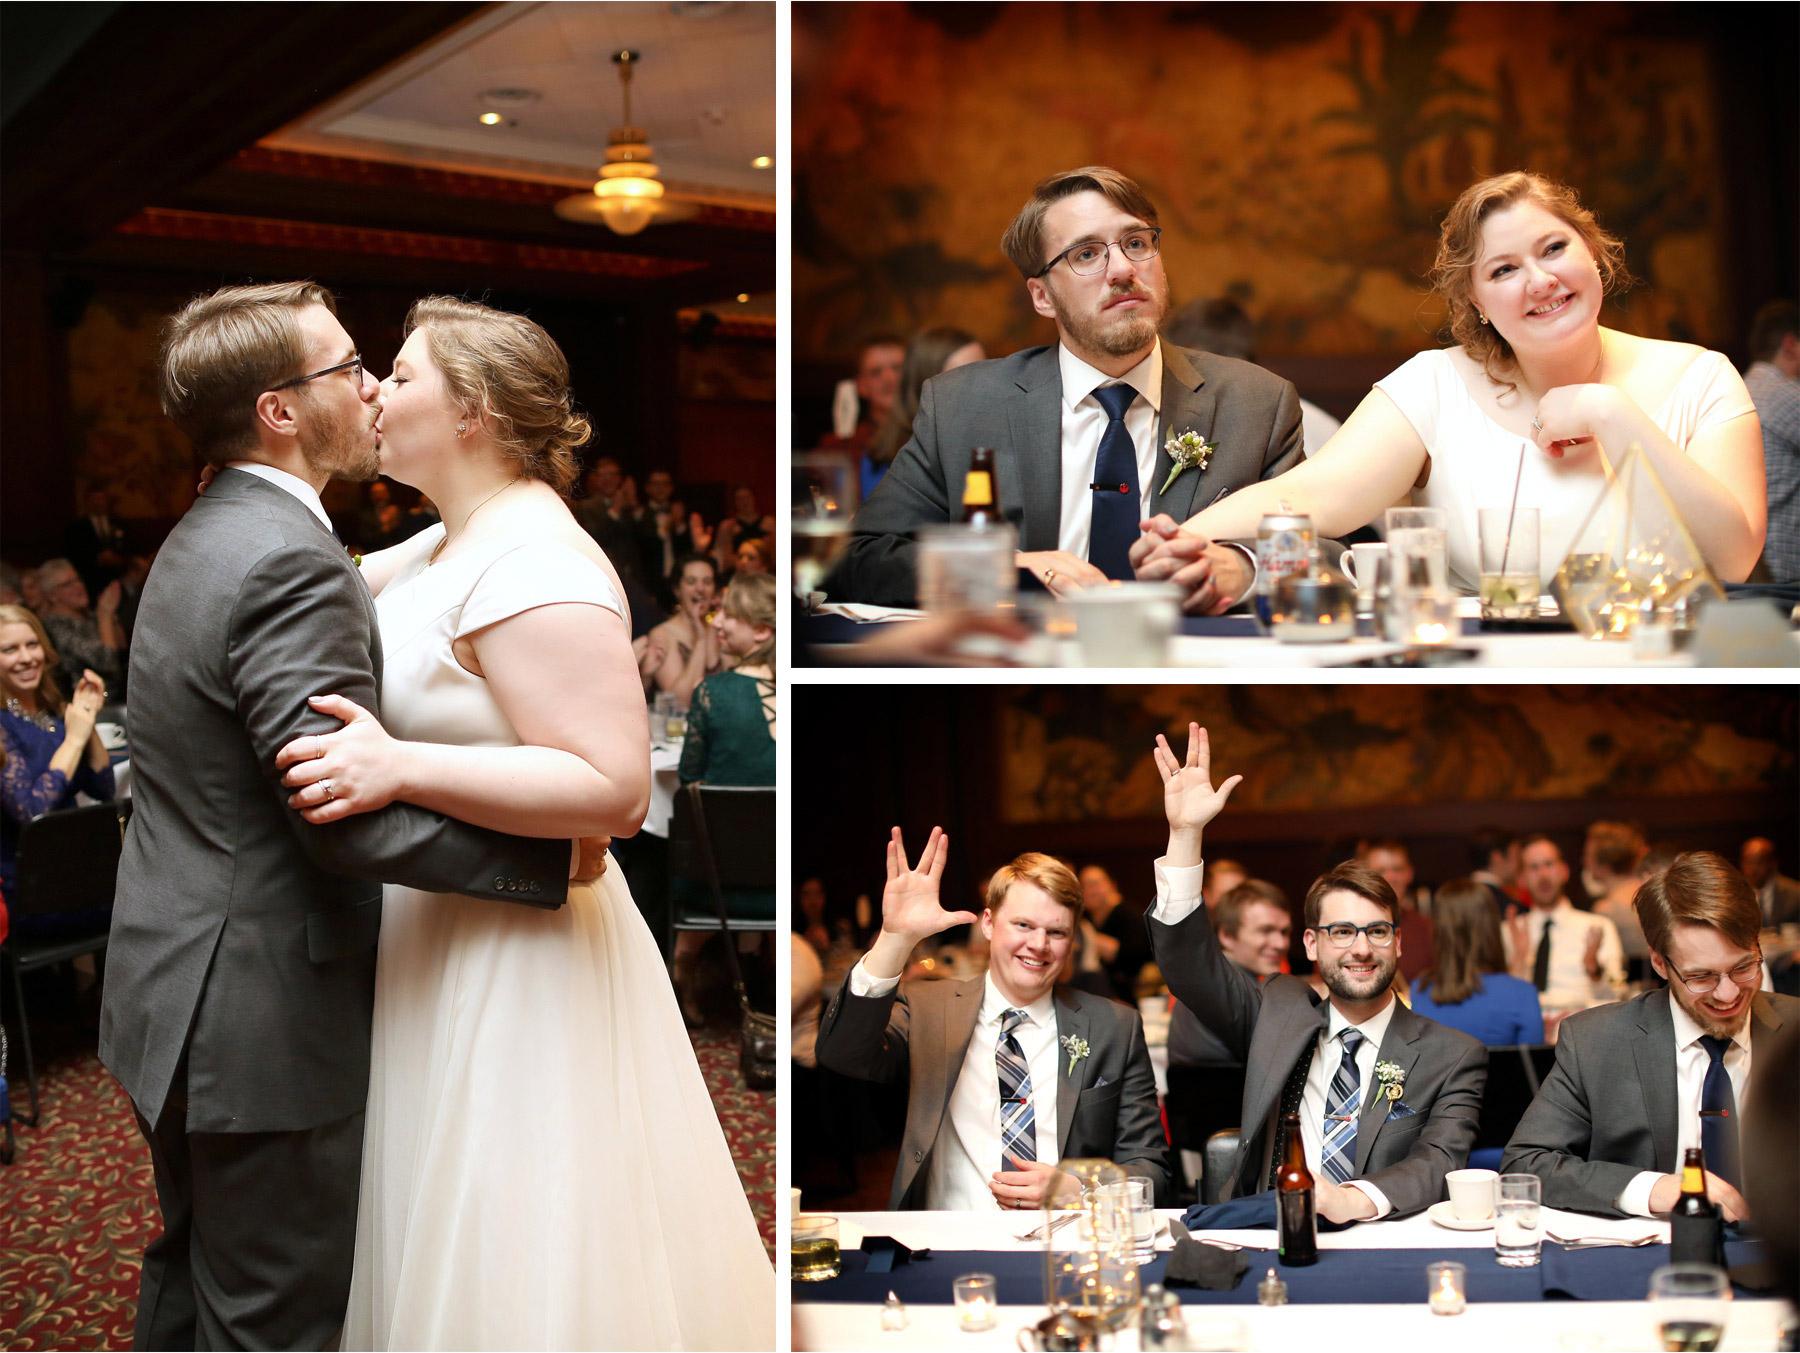 15-Minneapolis-Wedding-Photography-by-Vick-Photography-Reception-Metropolitan-Ballroom-Libby-and-Nathan.jpg